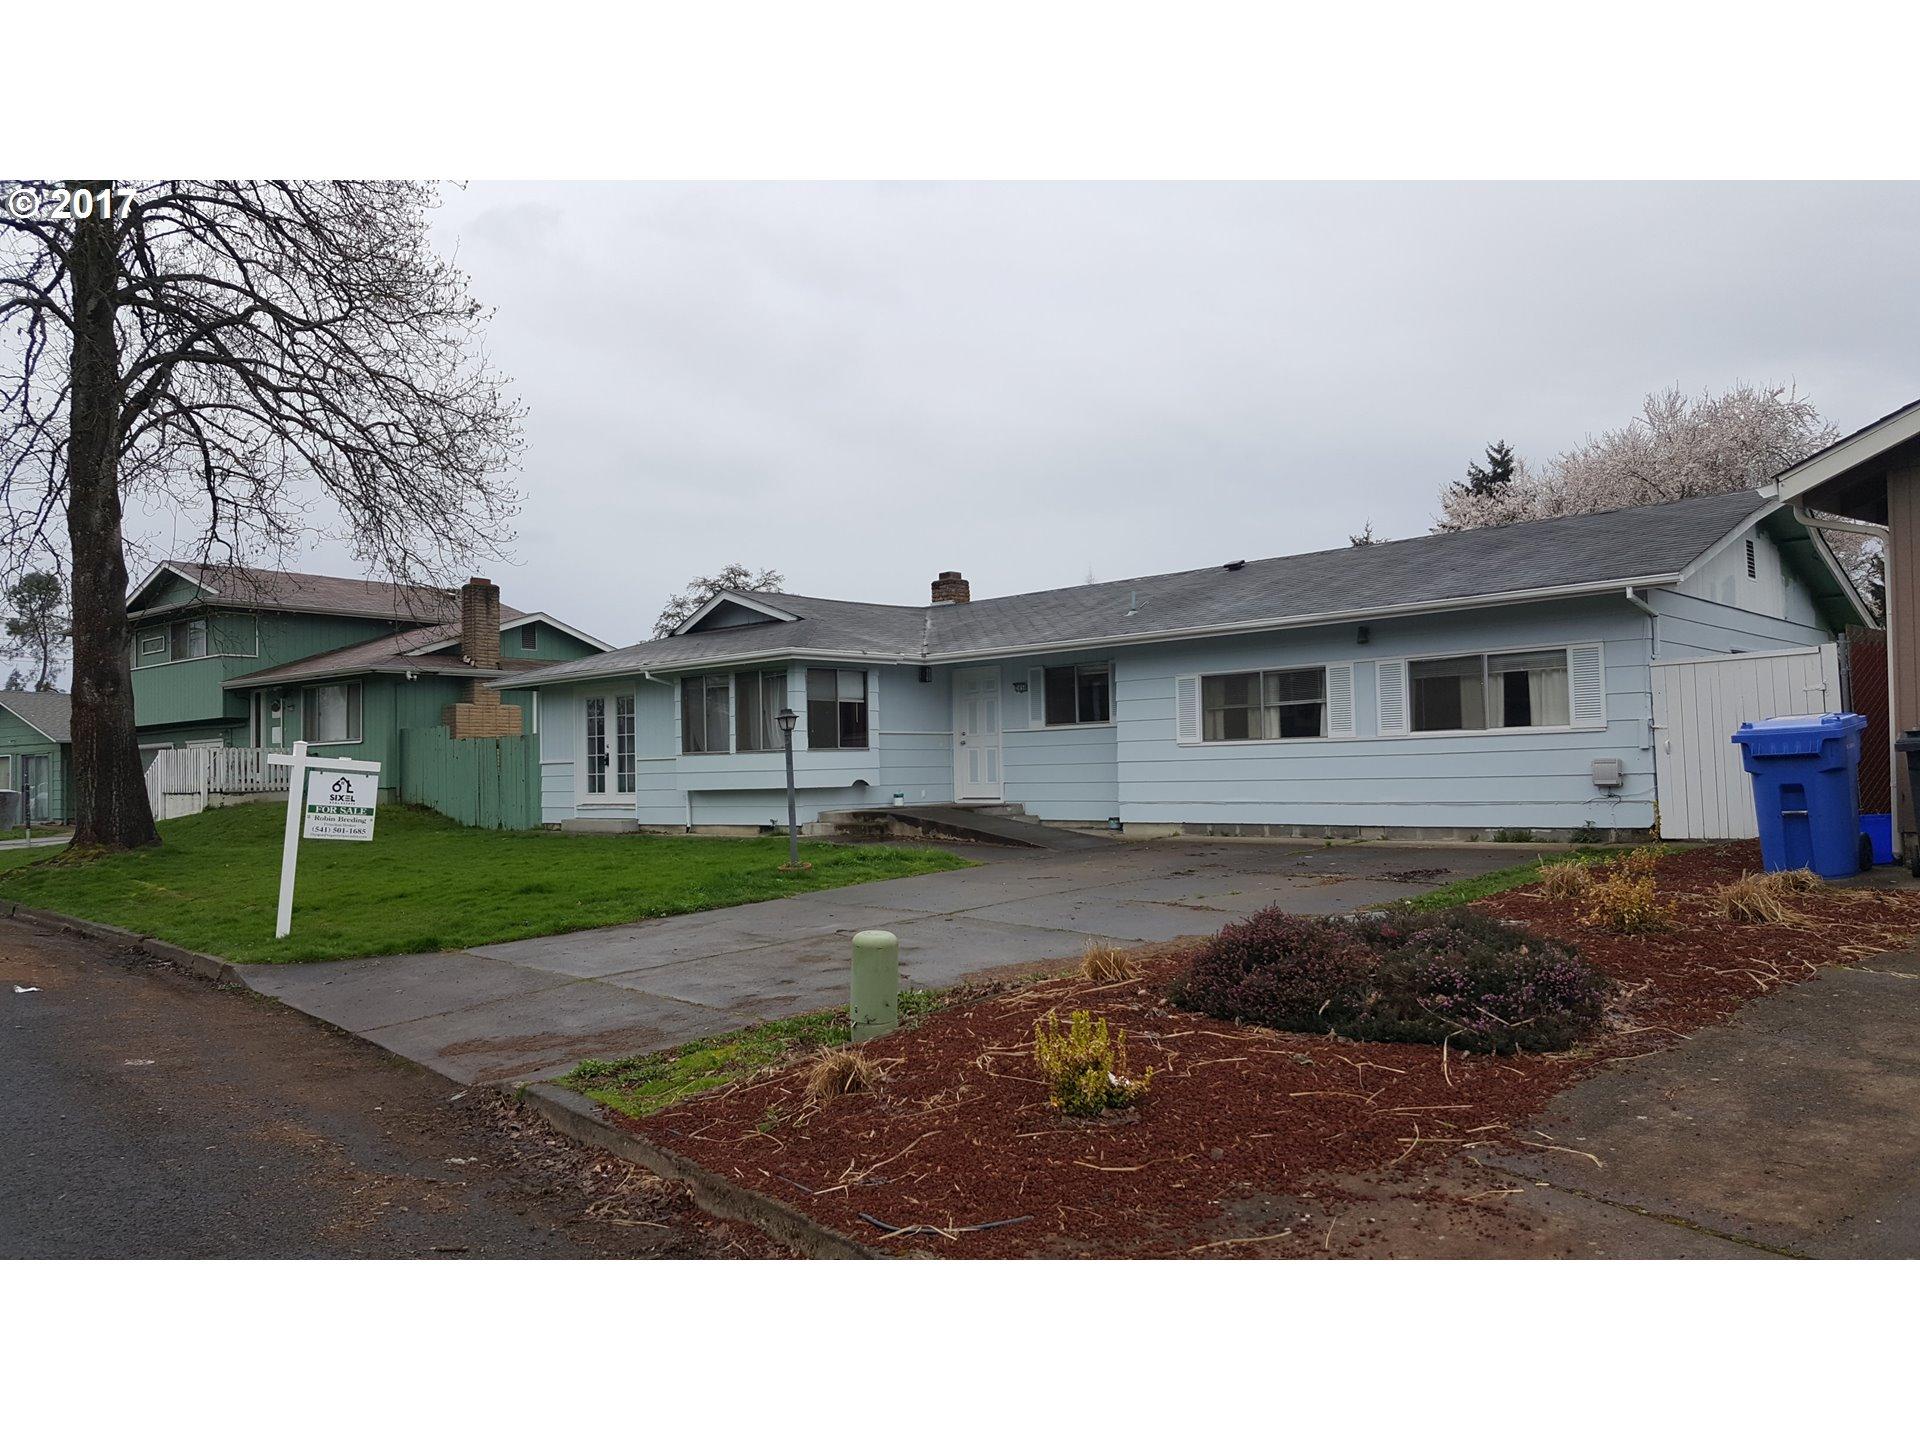 2050 PRIMROSE ST, Eugene, OR 97402